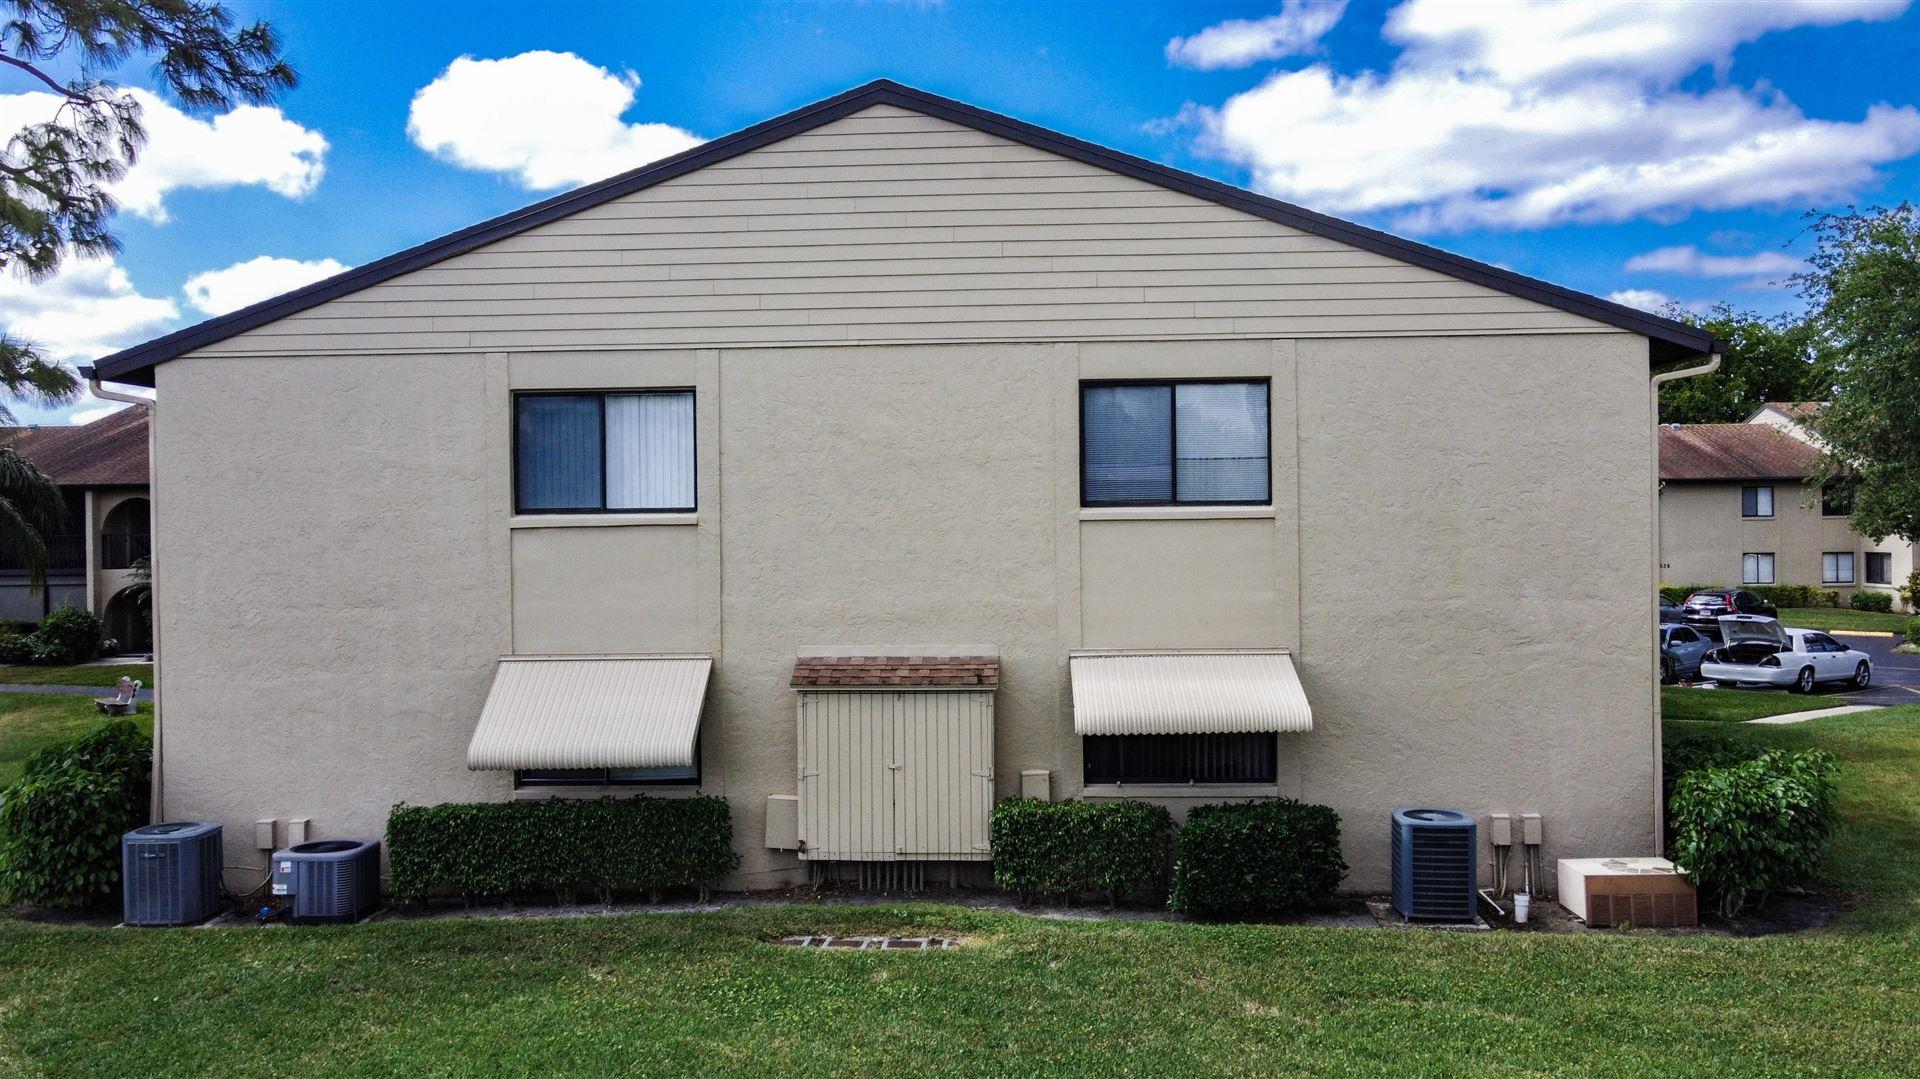 530 Shady Pine Way #A2, Greenacres, FL 33415 - #: RX-10699905